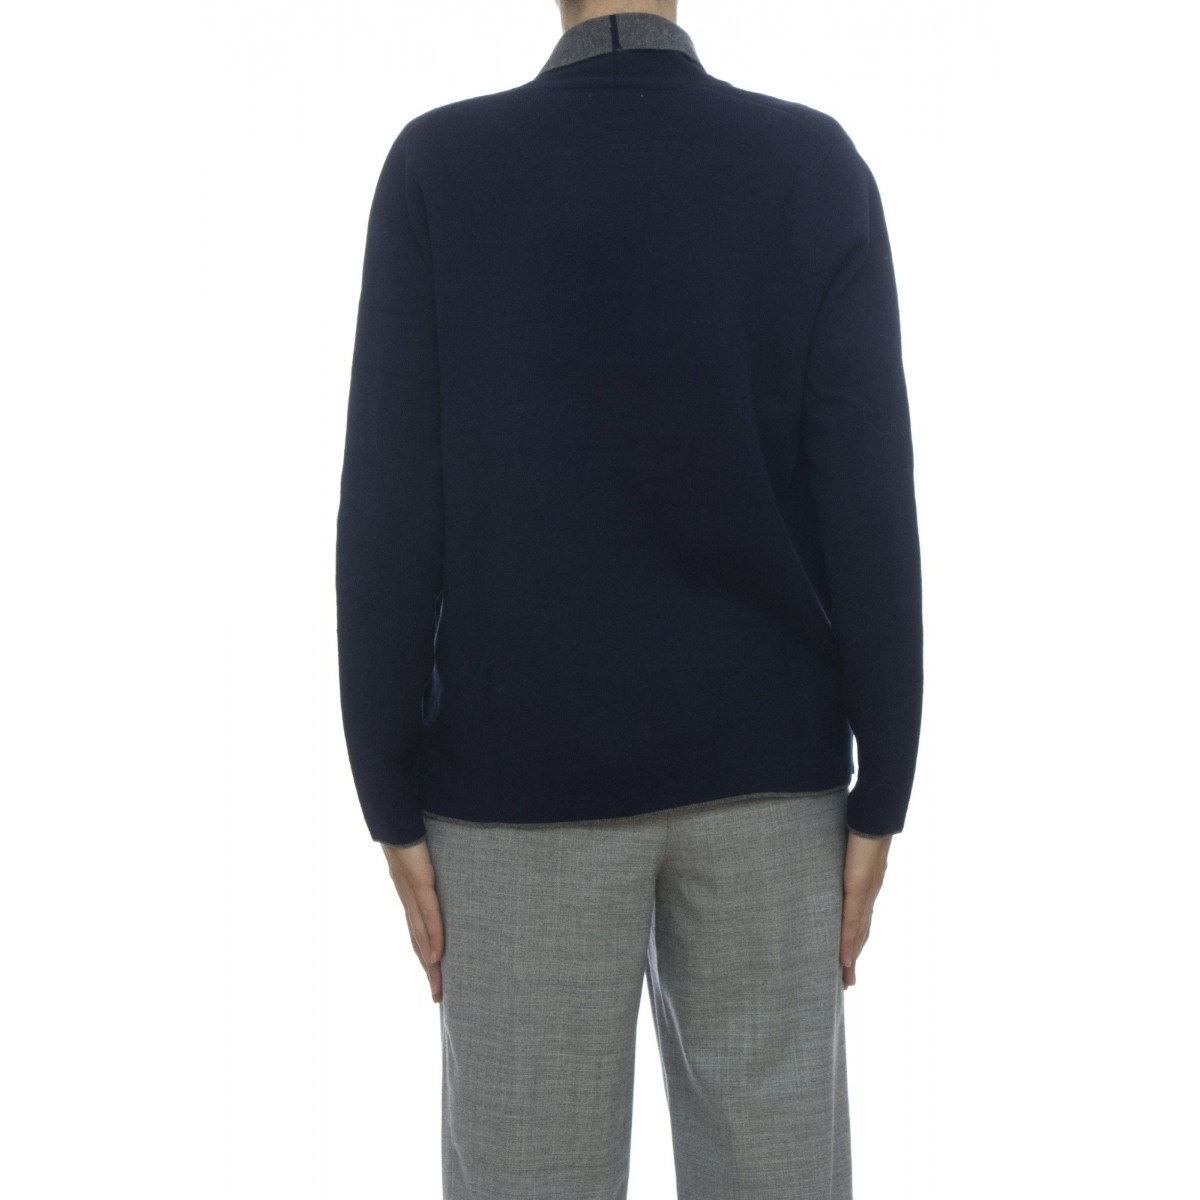 Giacca donna - 27252 giacchina bicolore